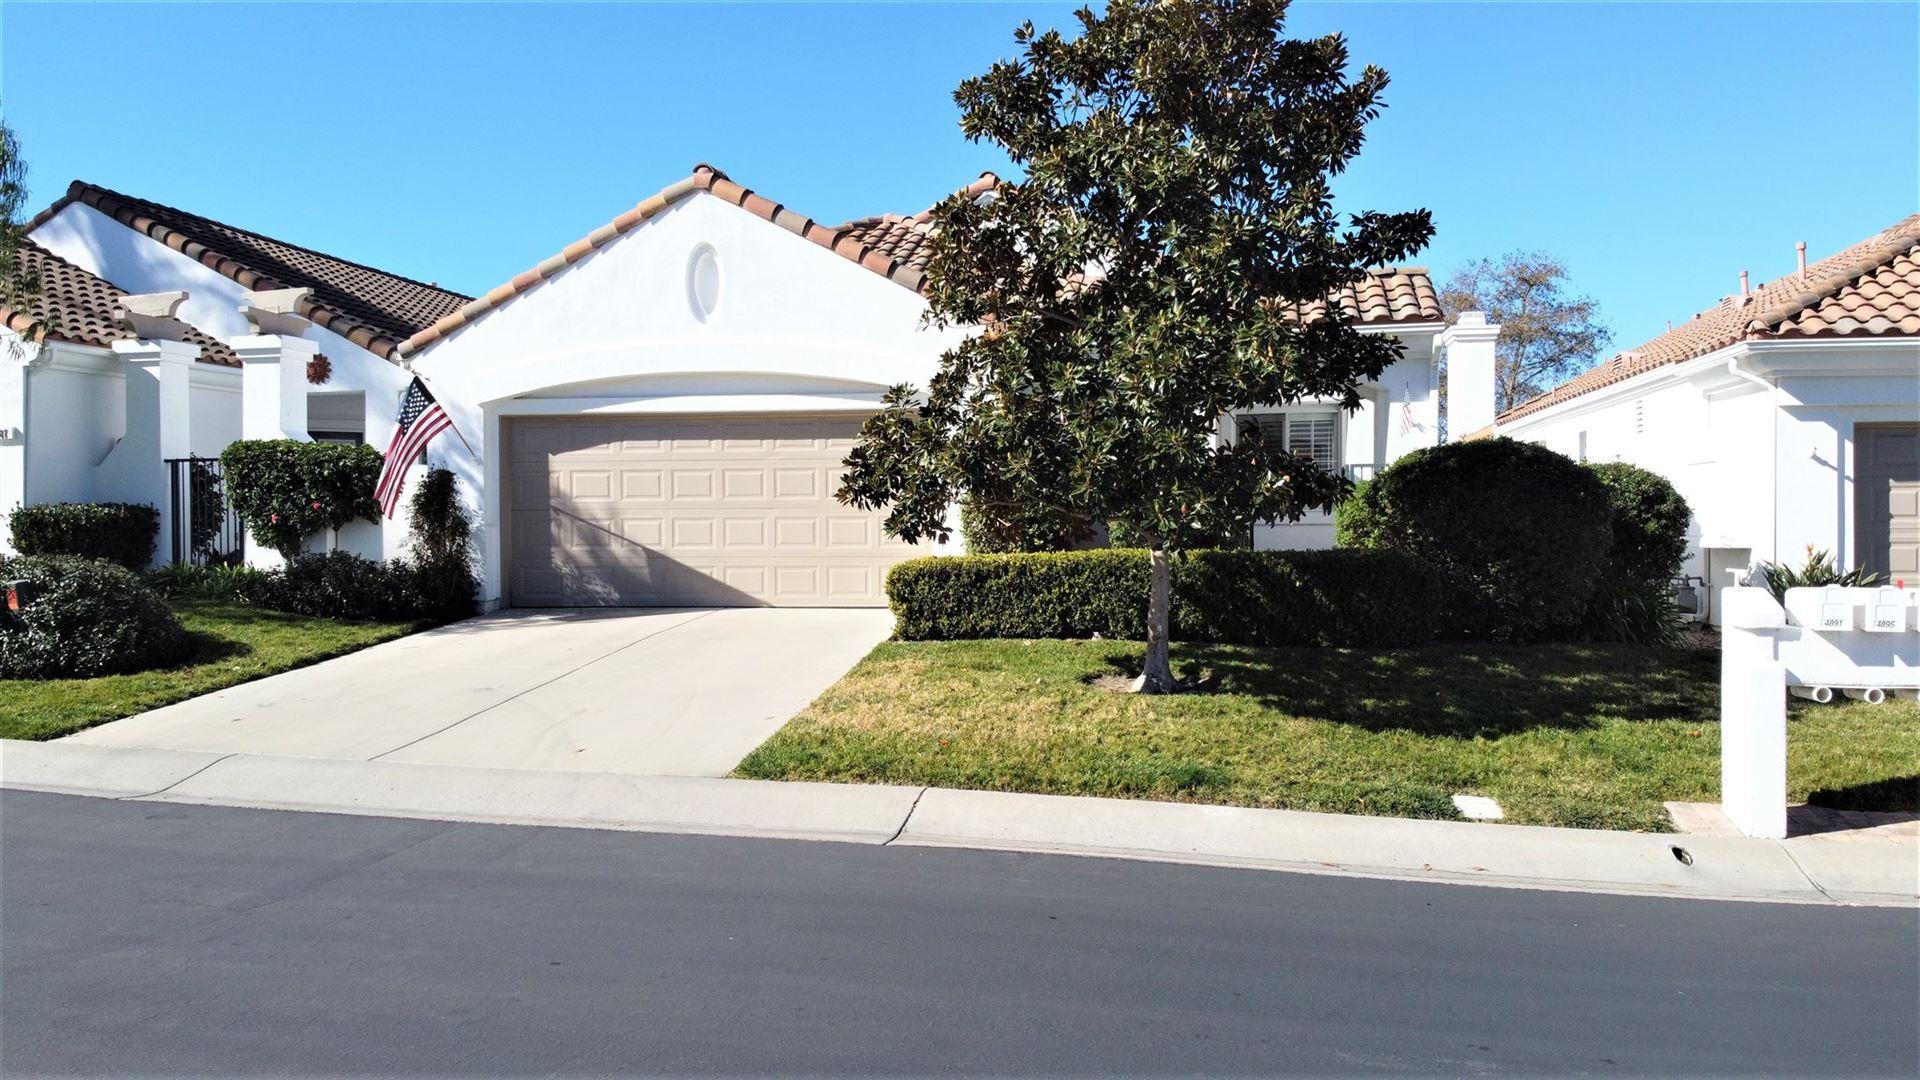 Photo of 4891 Thebes Way, Oceanside, CA 92056 (MLS # 210001679)